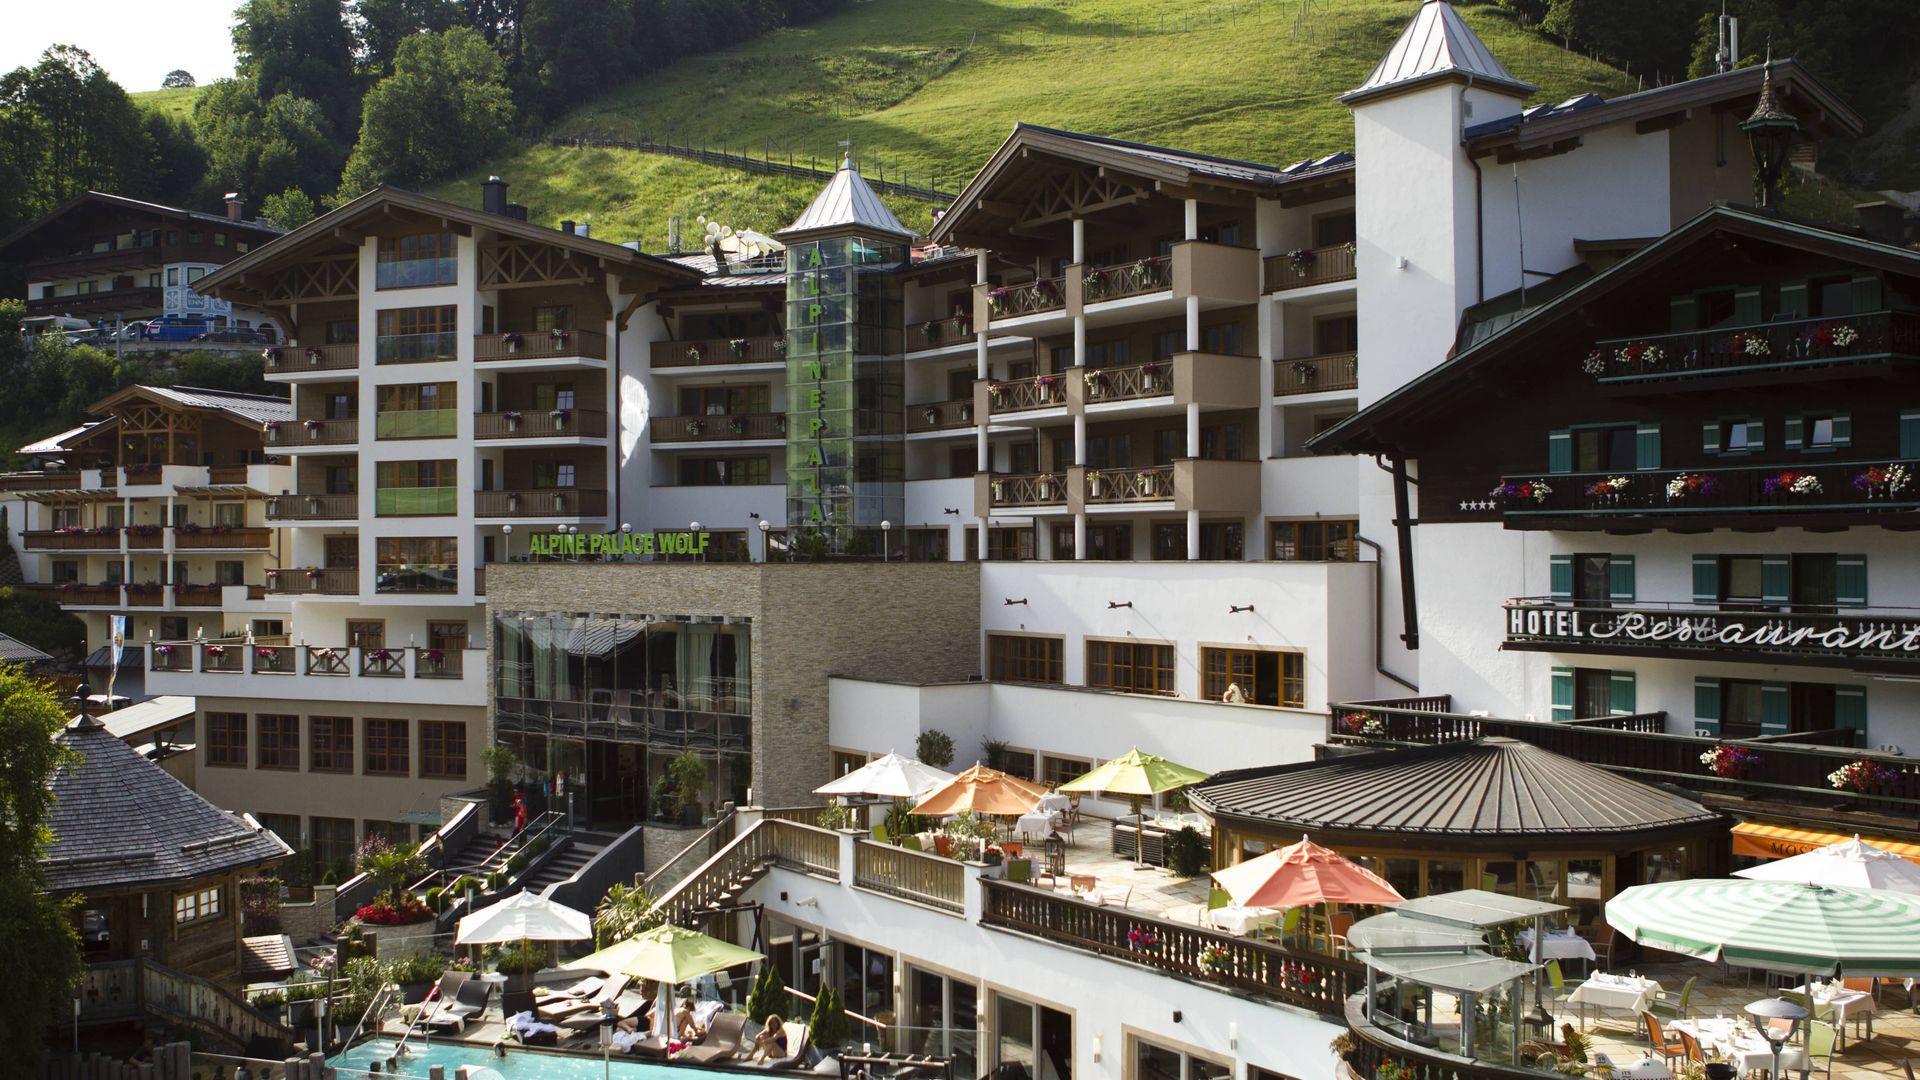 5*S Alpine Palace Hotel